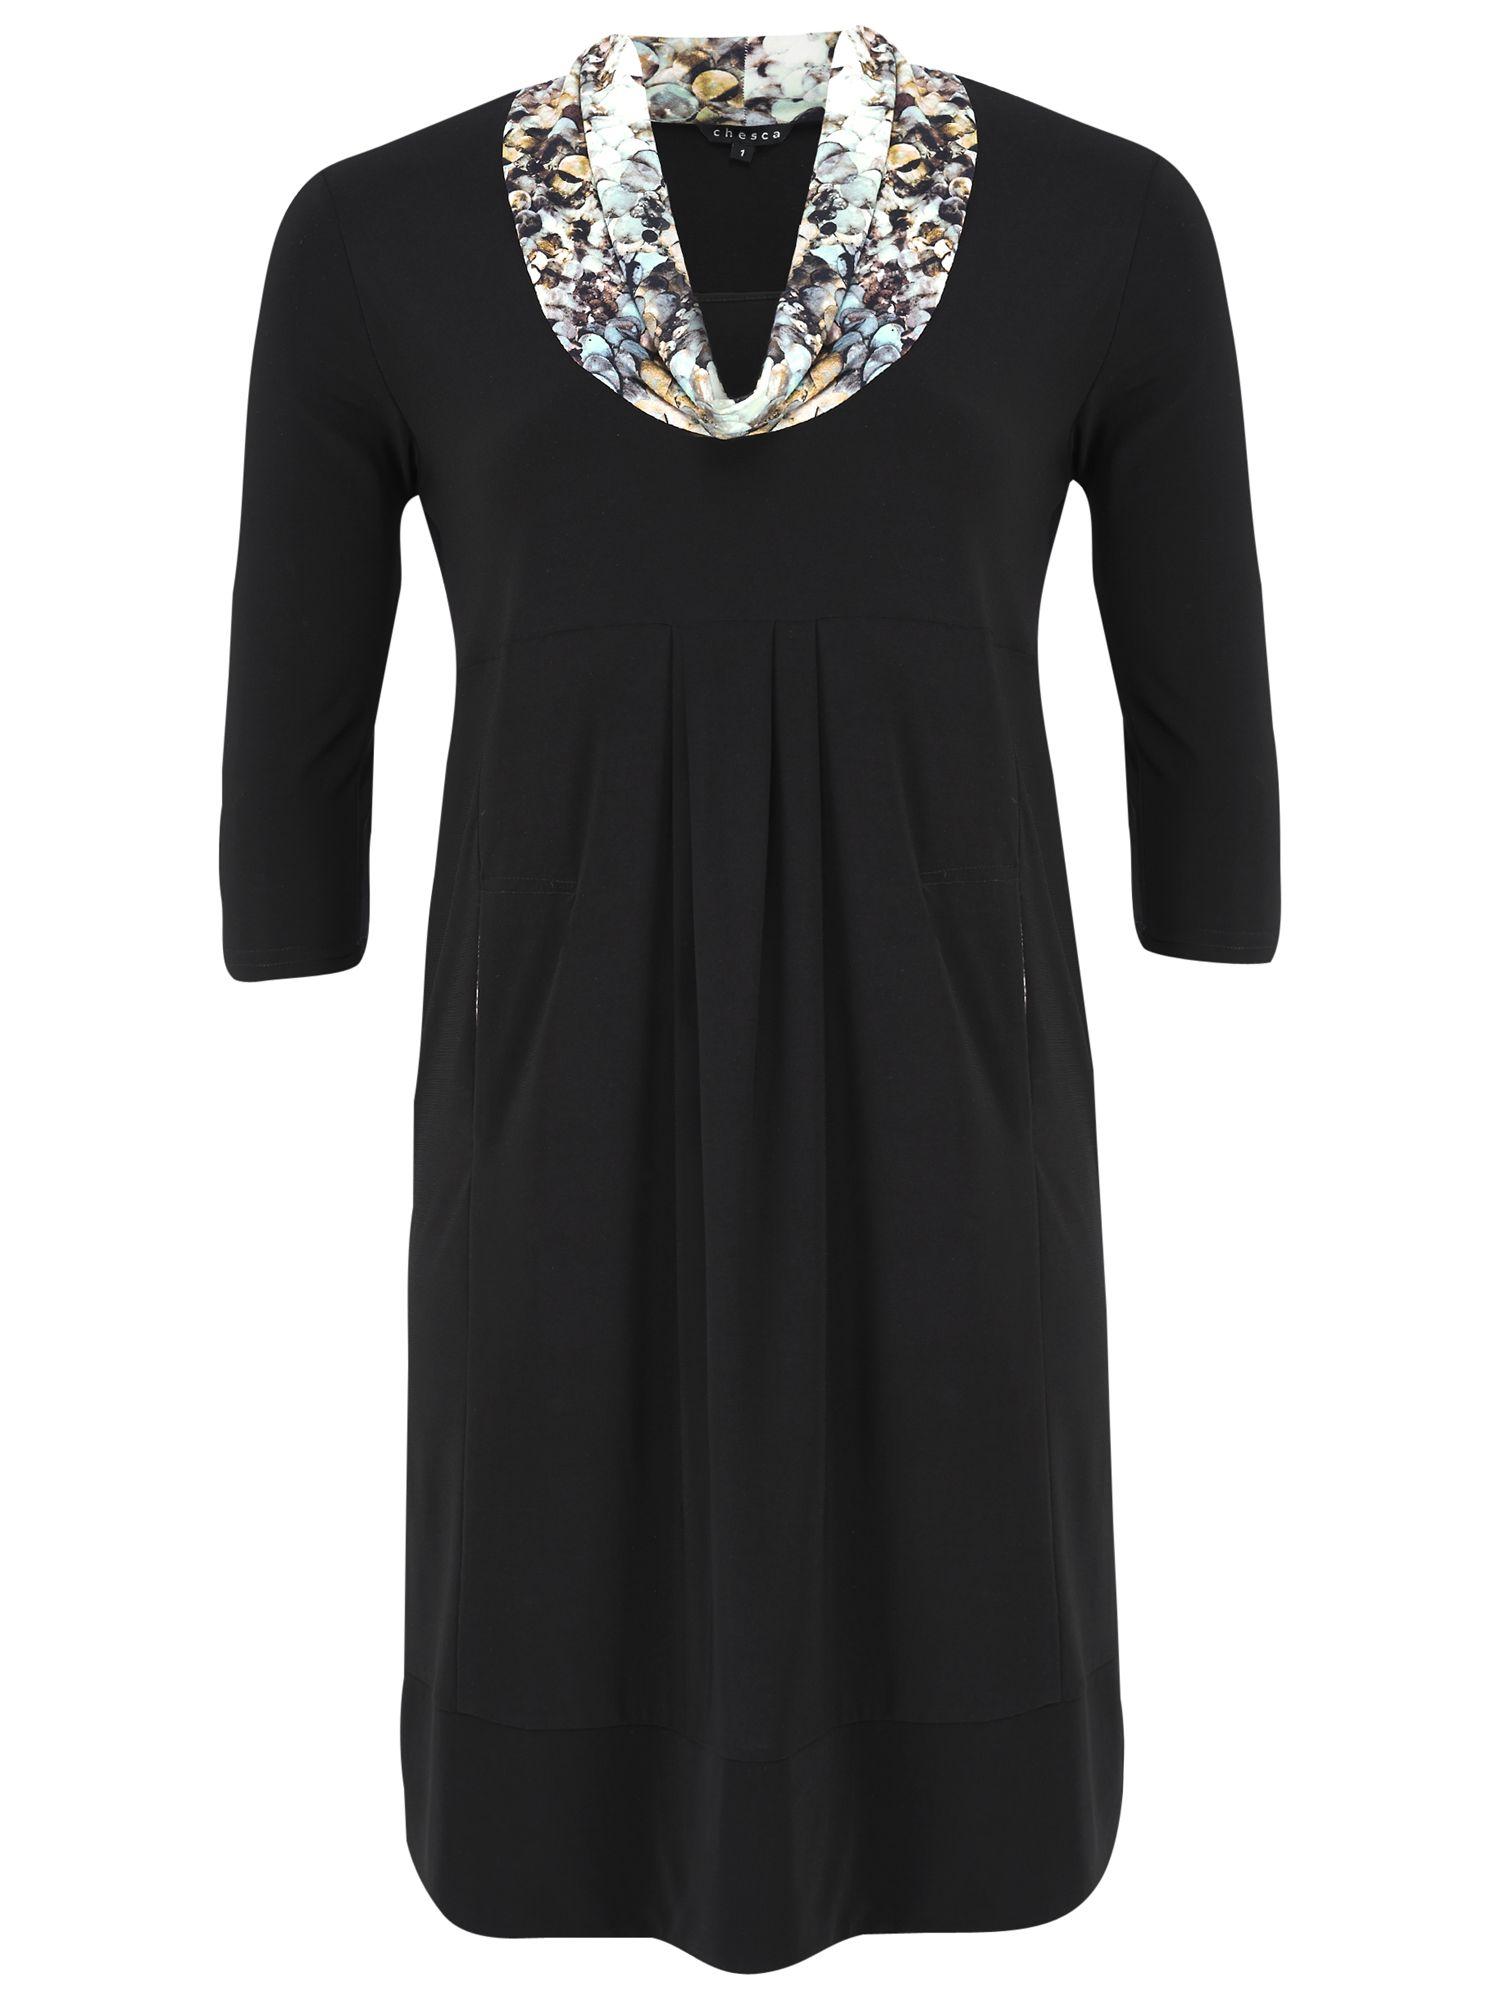 chesca jersey dress sequin collar black, chesca, jersey, dress, sequin, collar, black, 12-14|16-18|20-22|24-26, women, womens dresses, 1261422